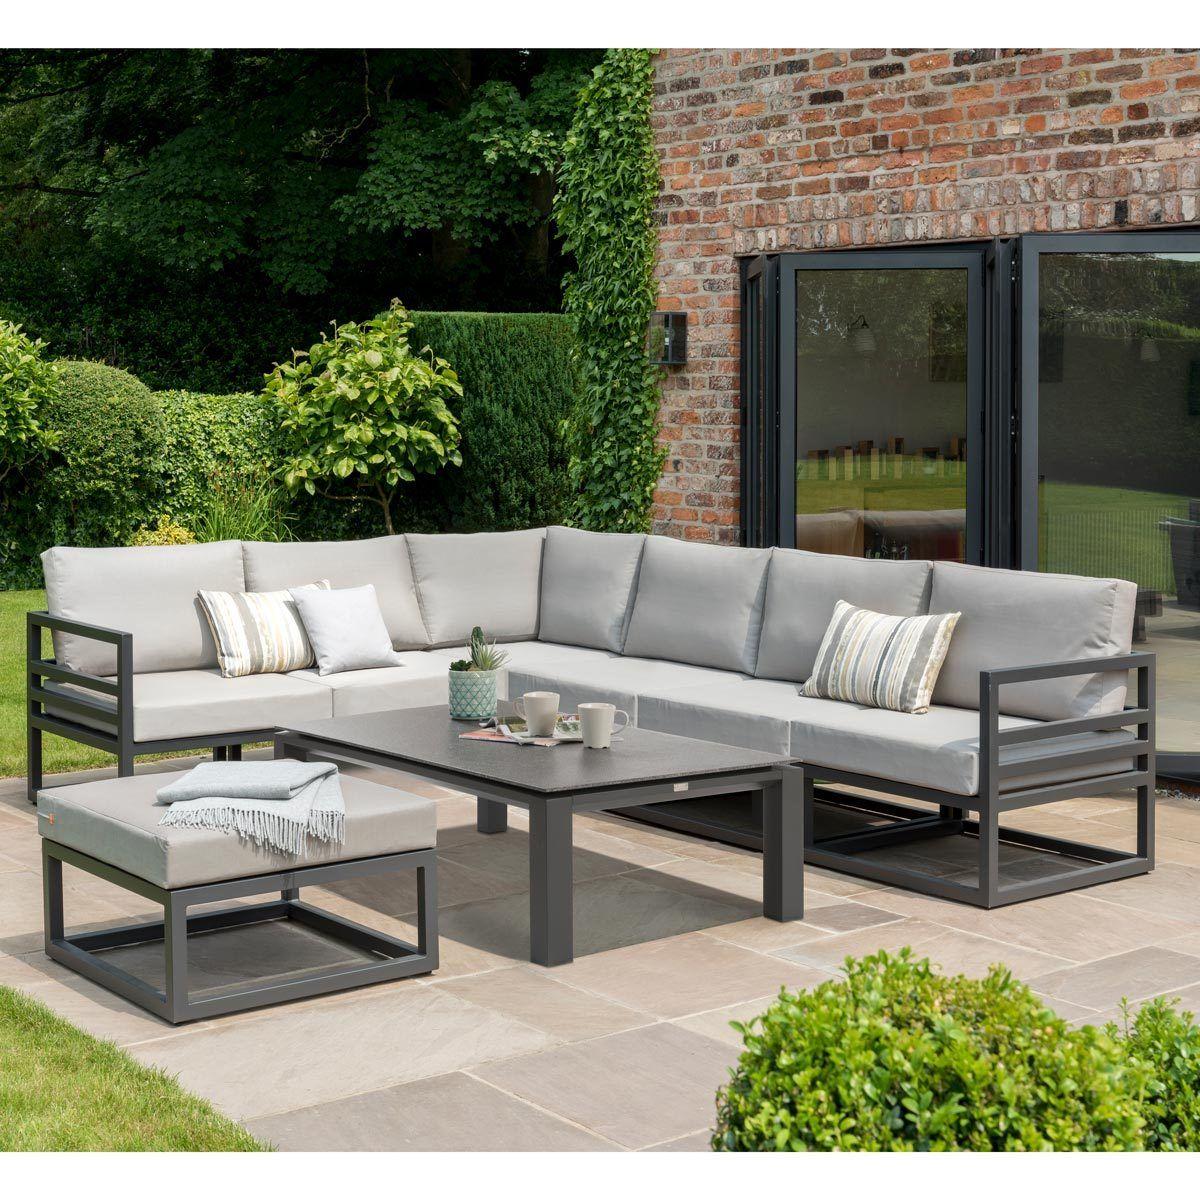 Life Outdoor Living Albury Aluminium 3 Piece Corner Seating Set Costco Uk Outdoor Living Garden Sofa Set Corner Seating